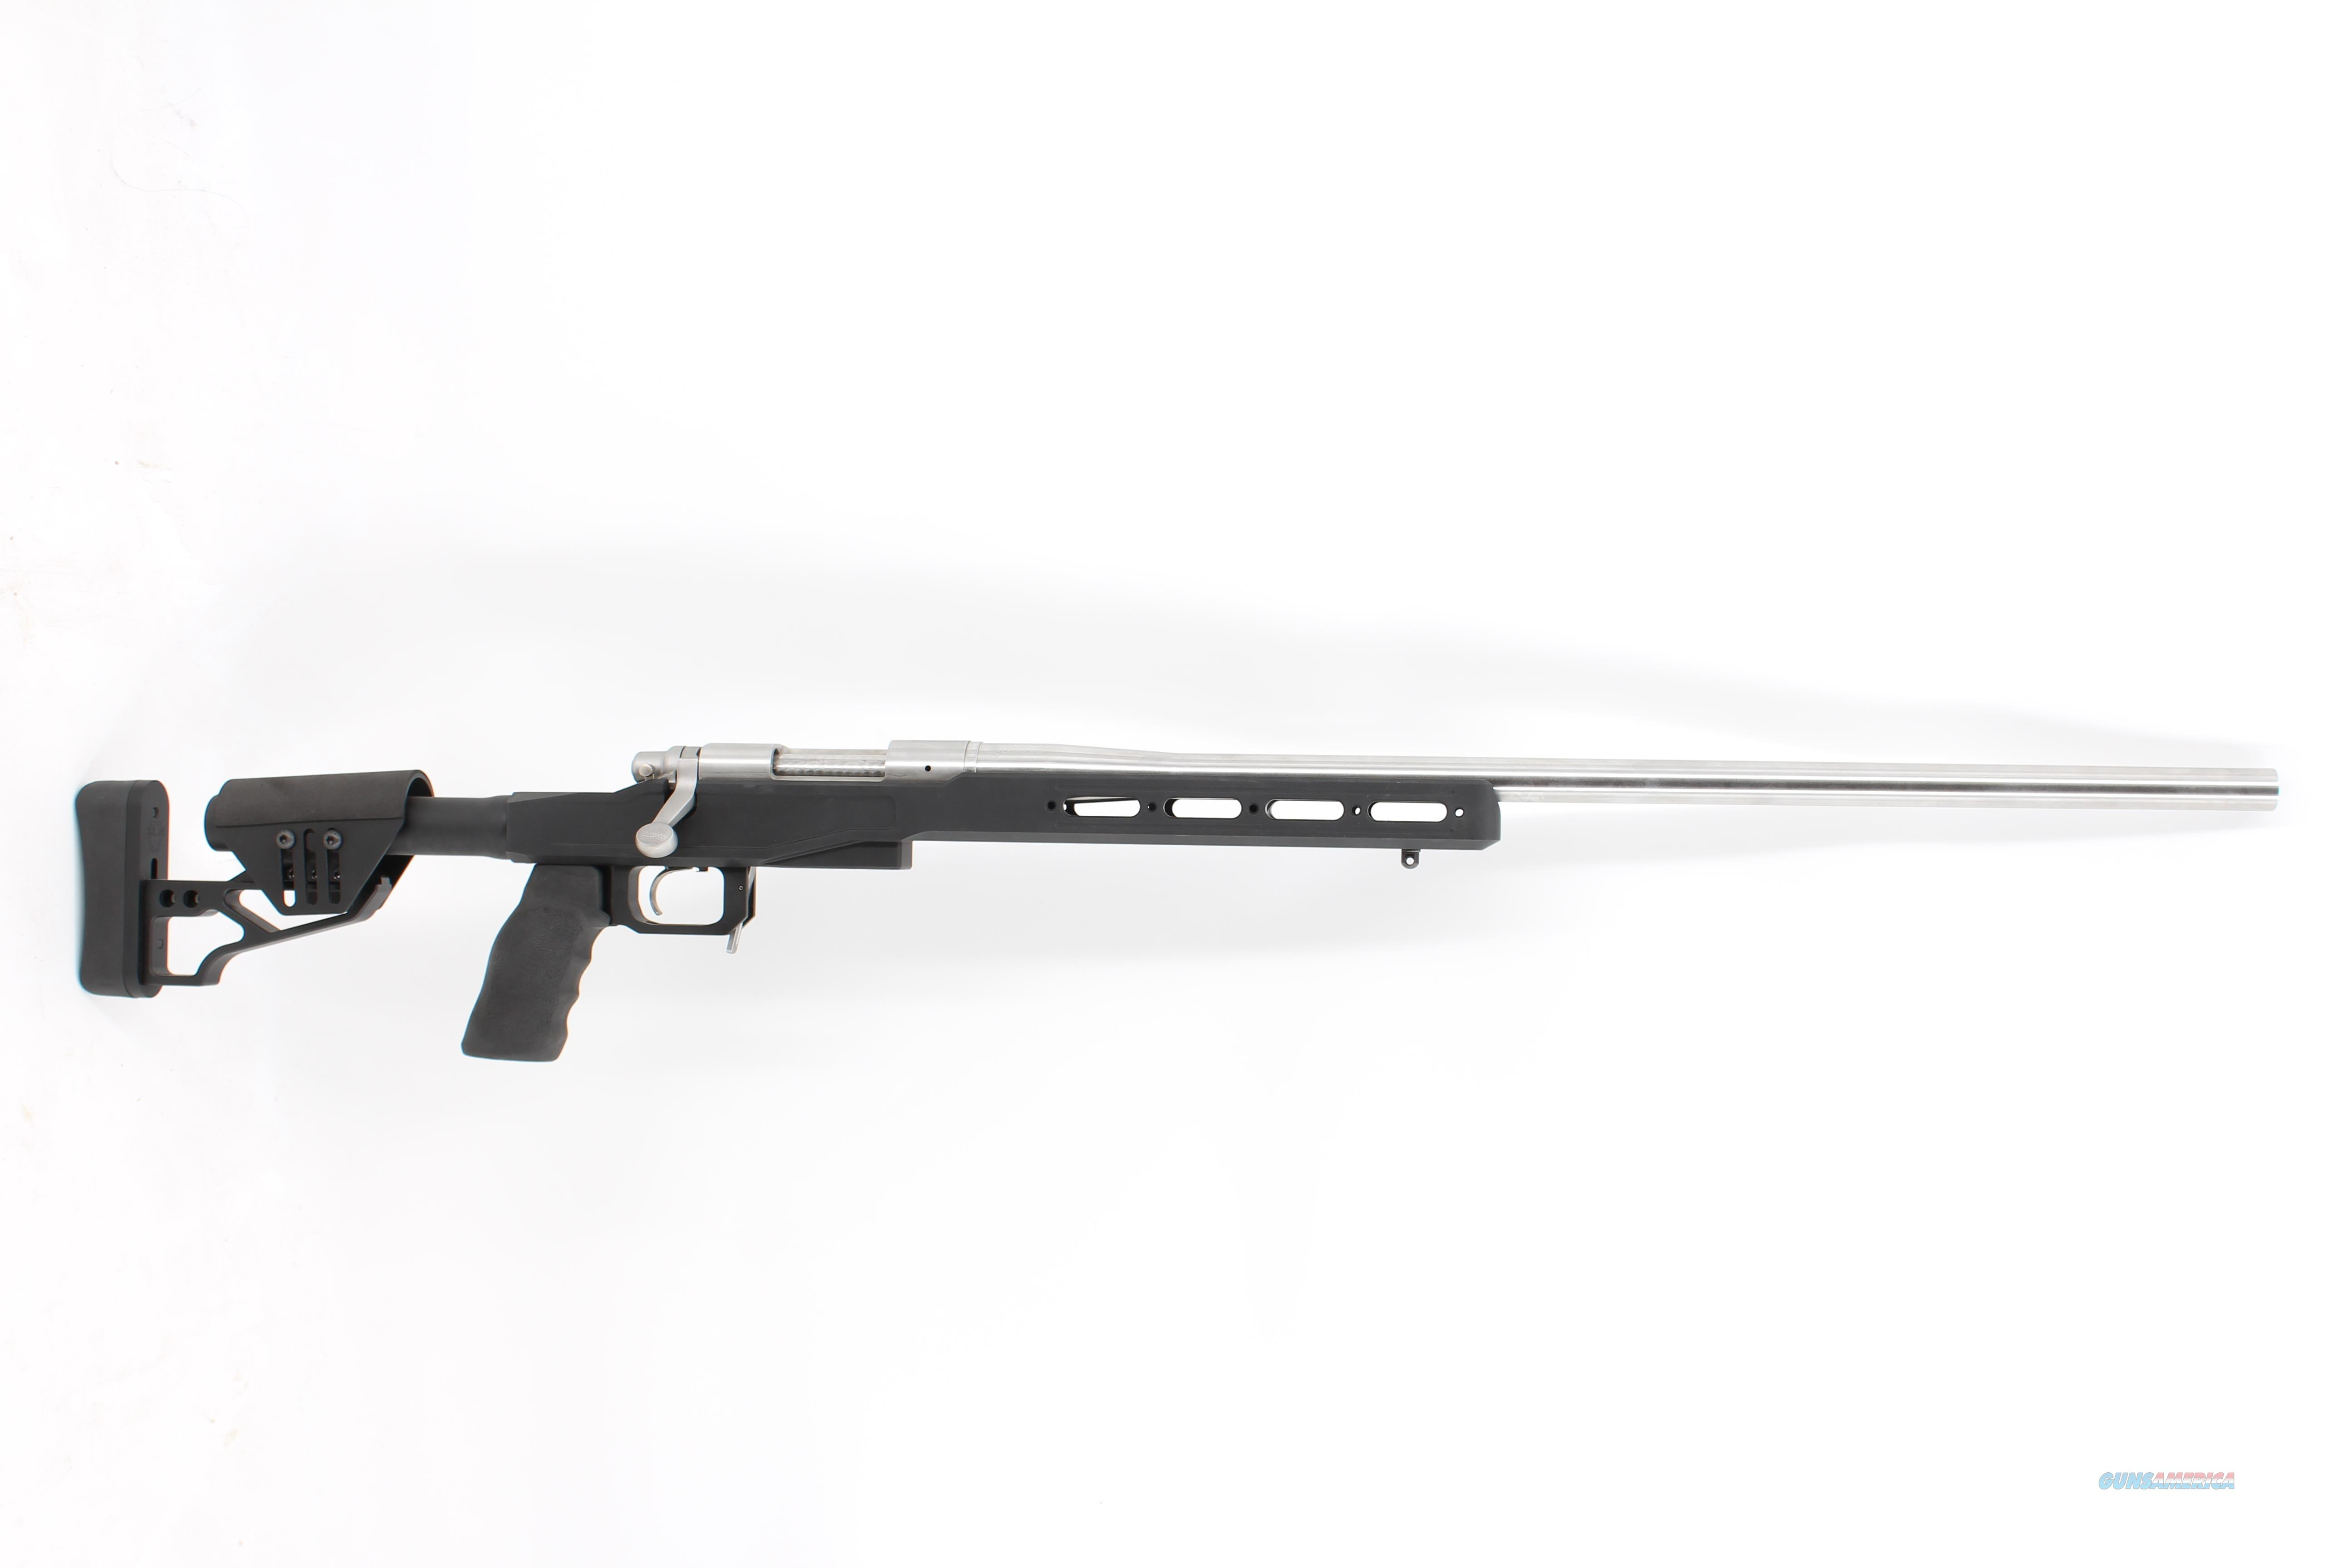 Trued Rem700 TS Customs 6.5x47Lapua XLR Element  Guns > Rifles > Remington Rifles - Modern > Model 700 > Tactical